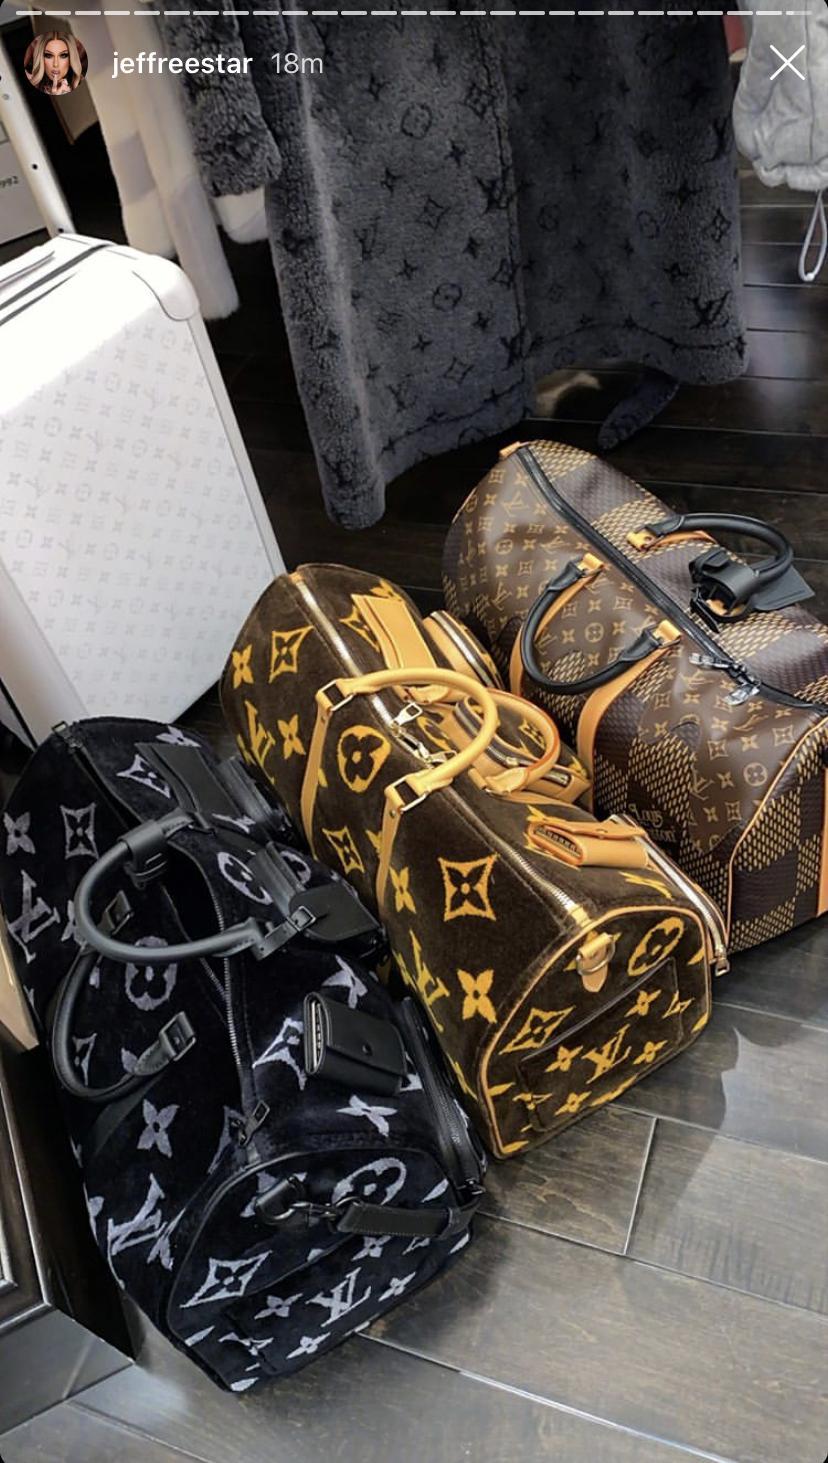 Jeffree Star Closet Tour See The Youtuber S Designer Pieces